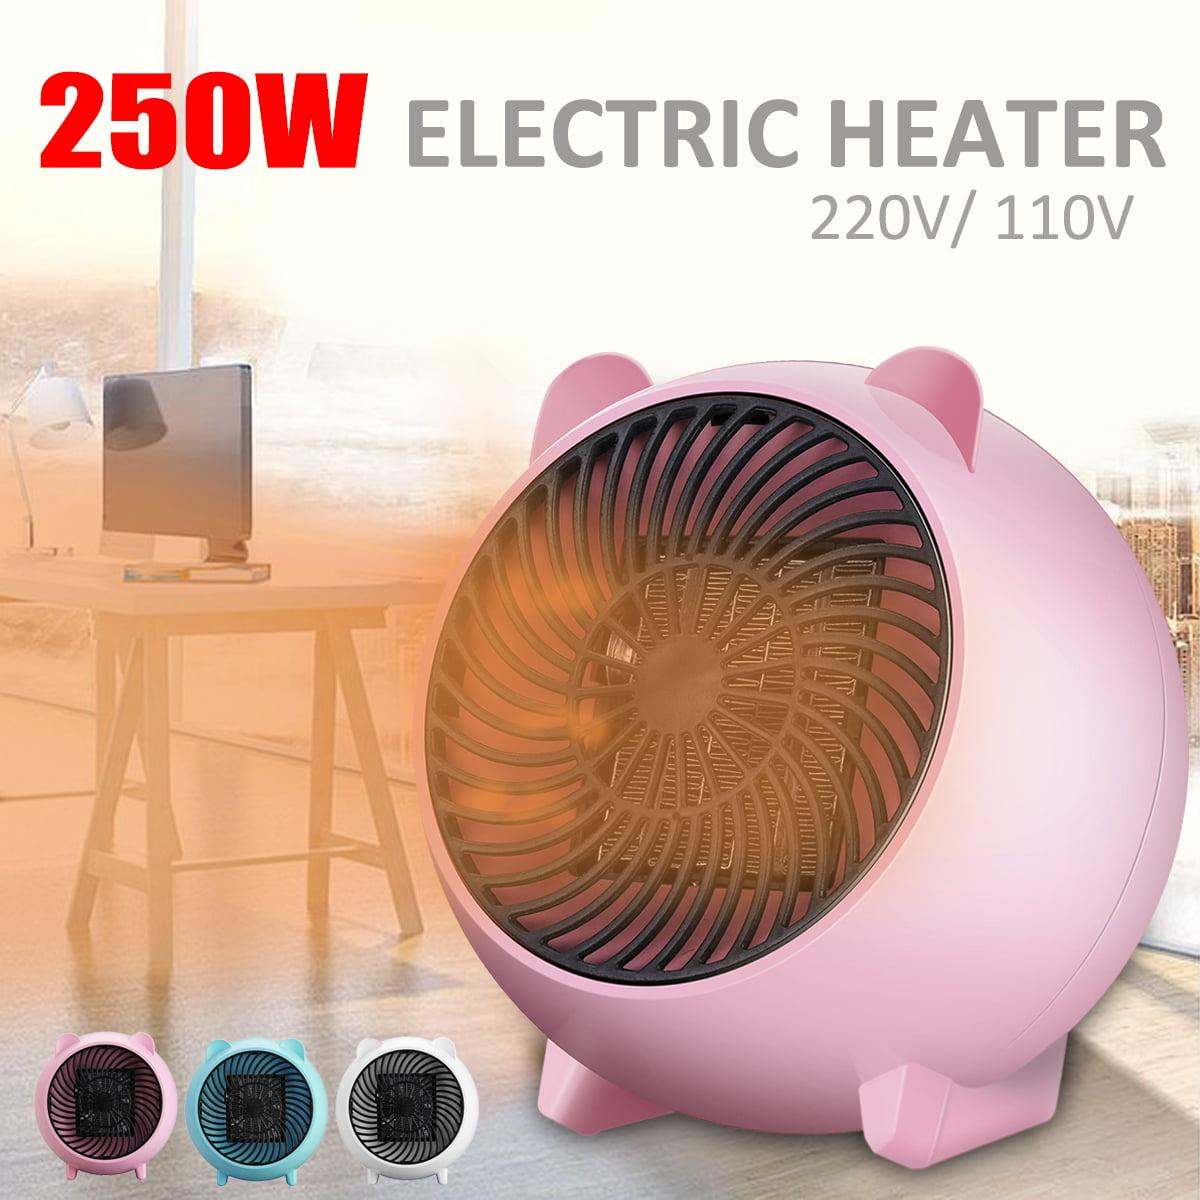 250W Quiet Heater Office Home Mini Desktop Small Household Air Heater Eletrical Air Warmer Equipment Winter Bask Fan